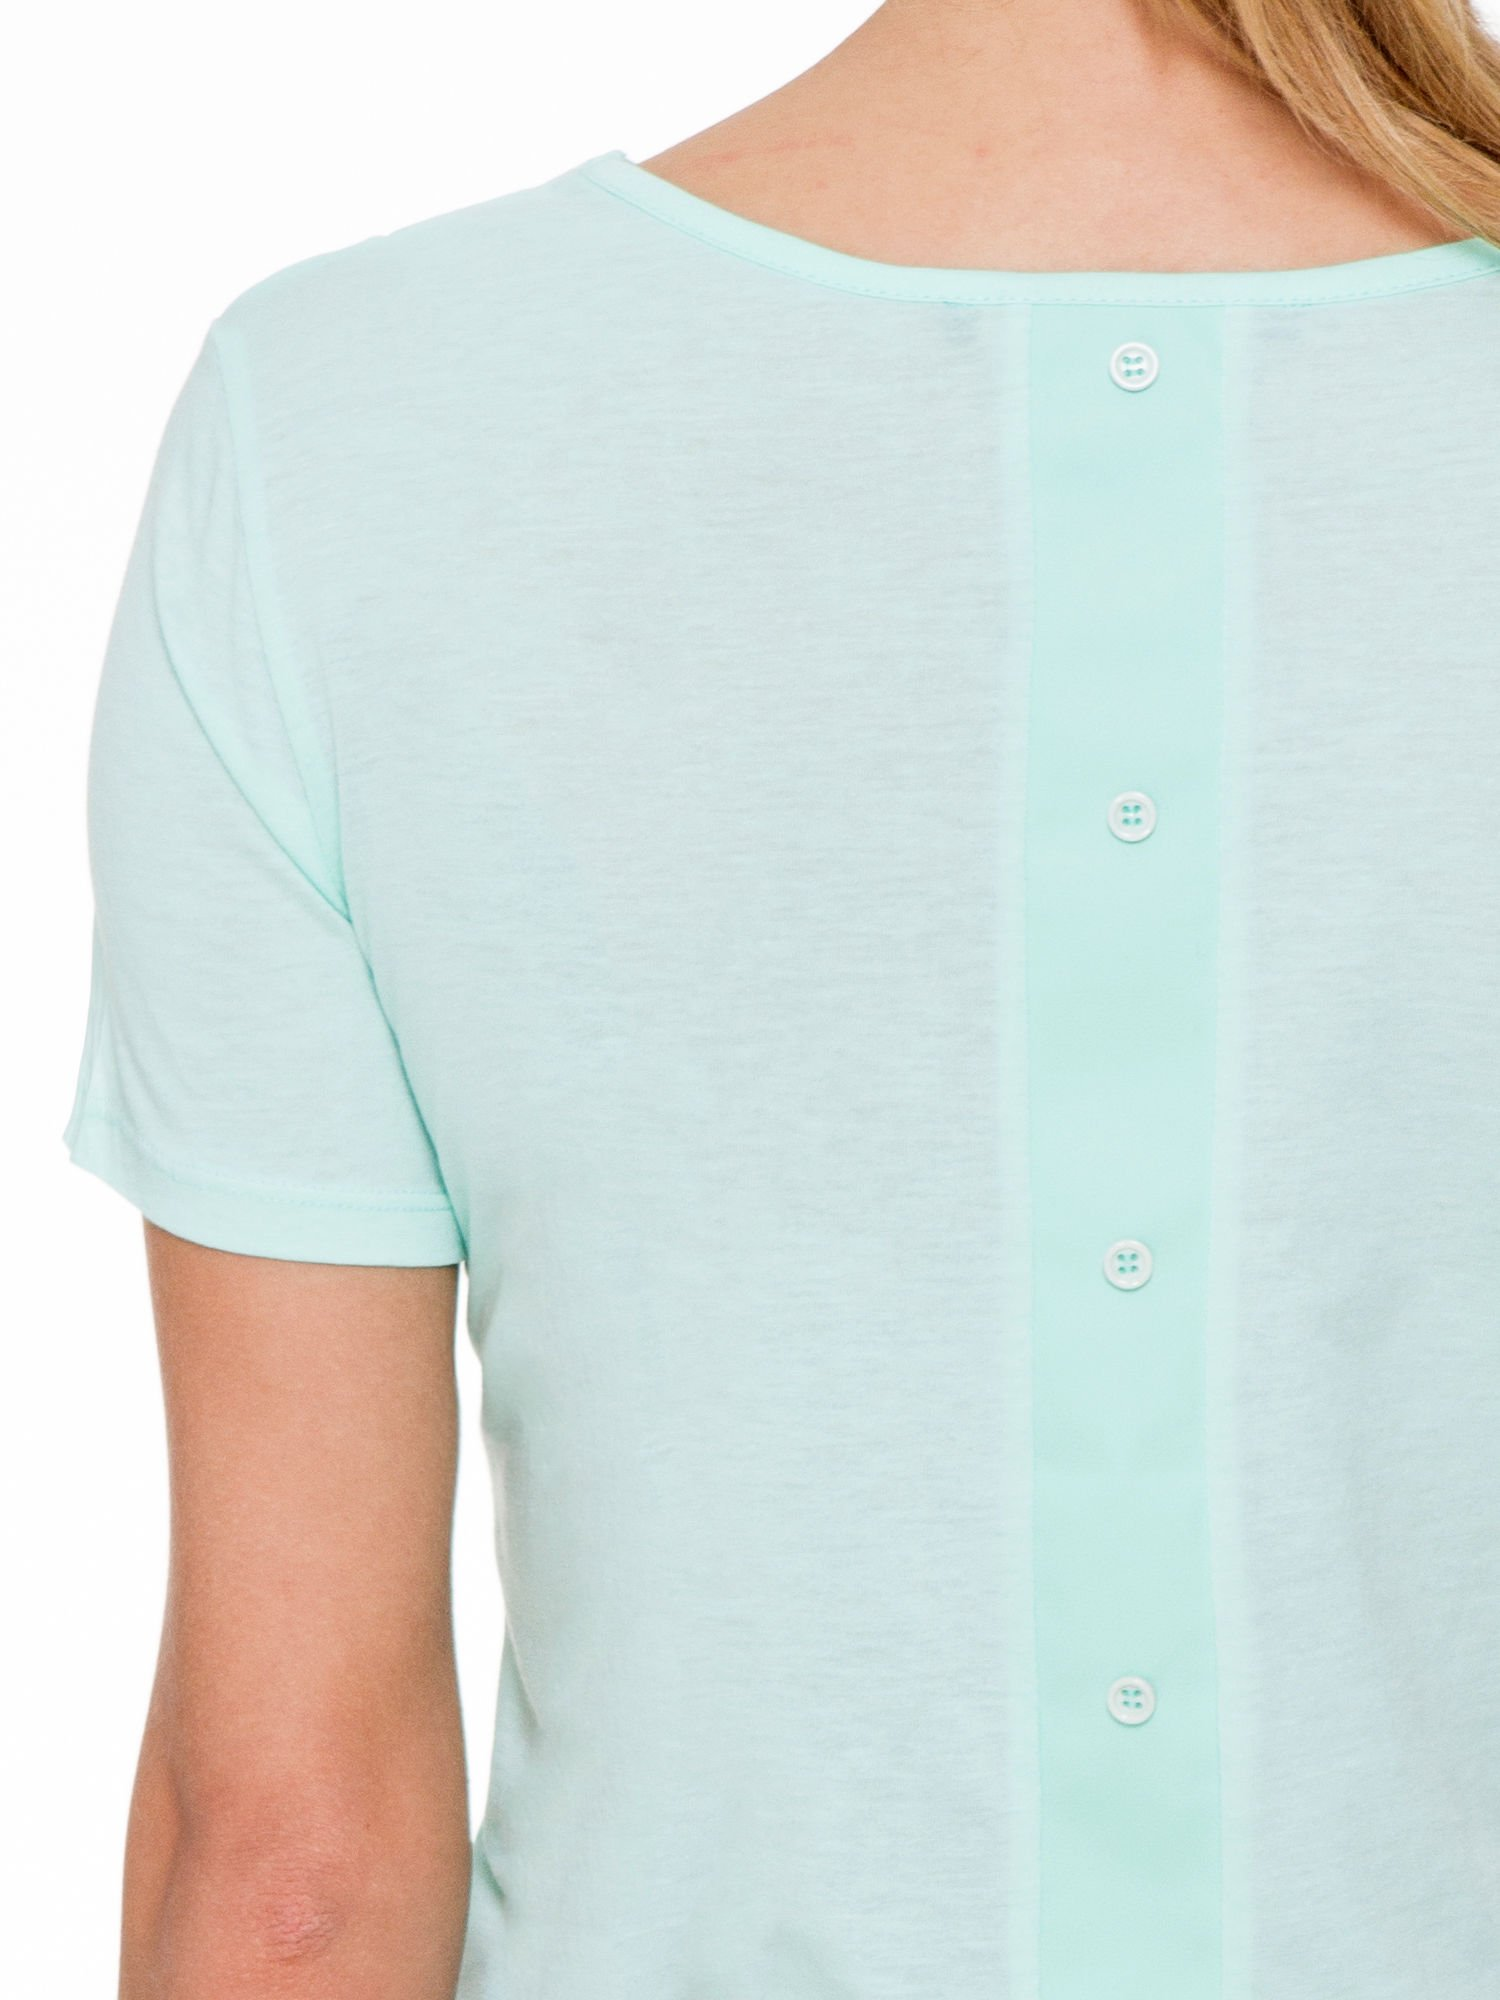 Miętowy t-shirt z dekoltem cut out                                  zdj.                                  5